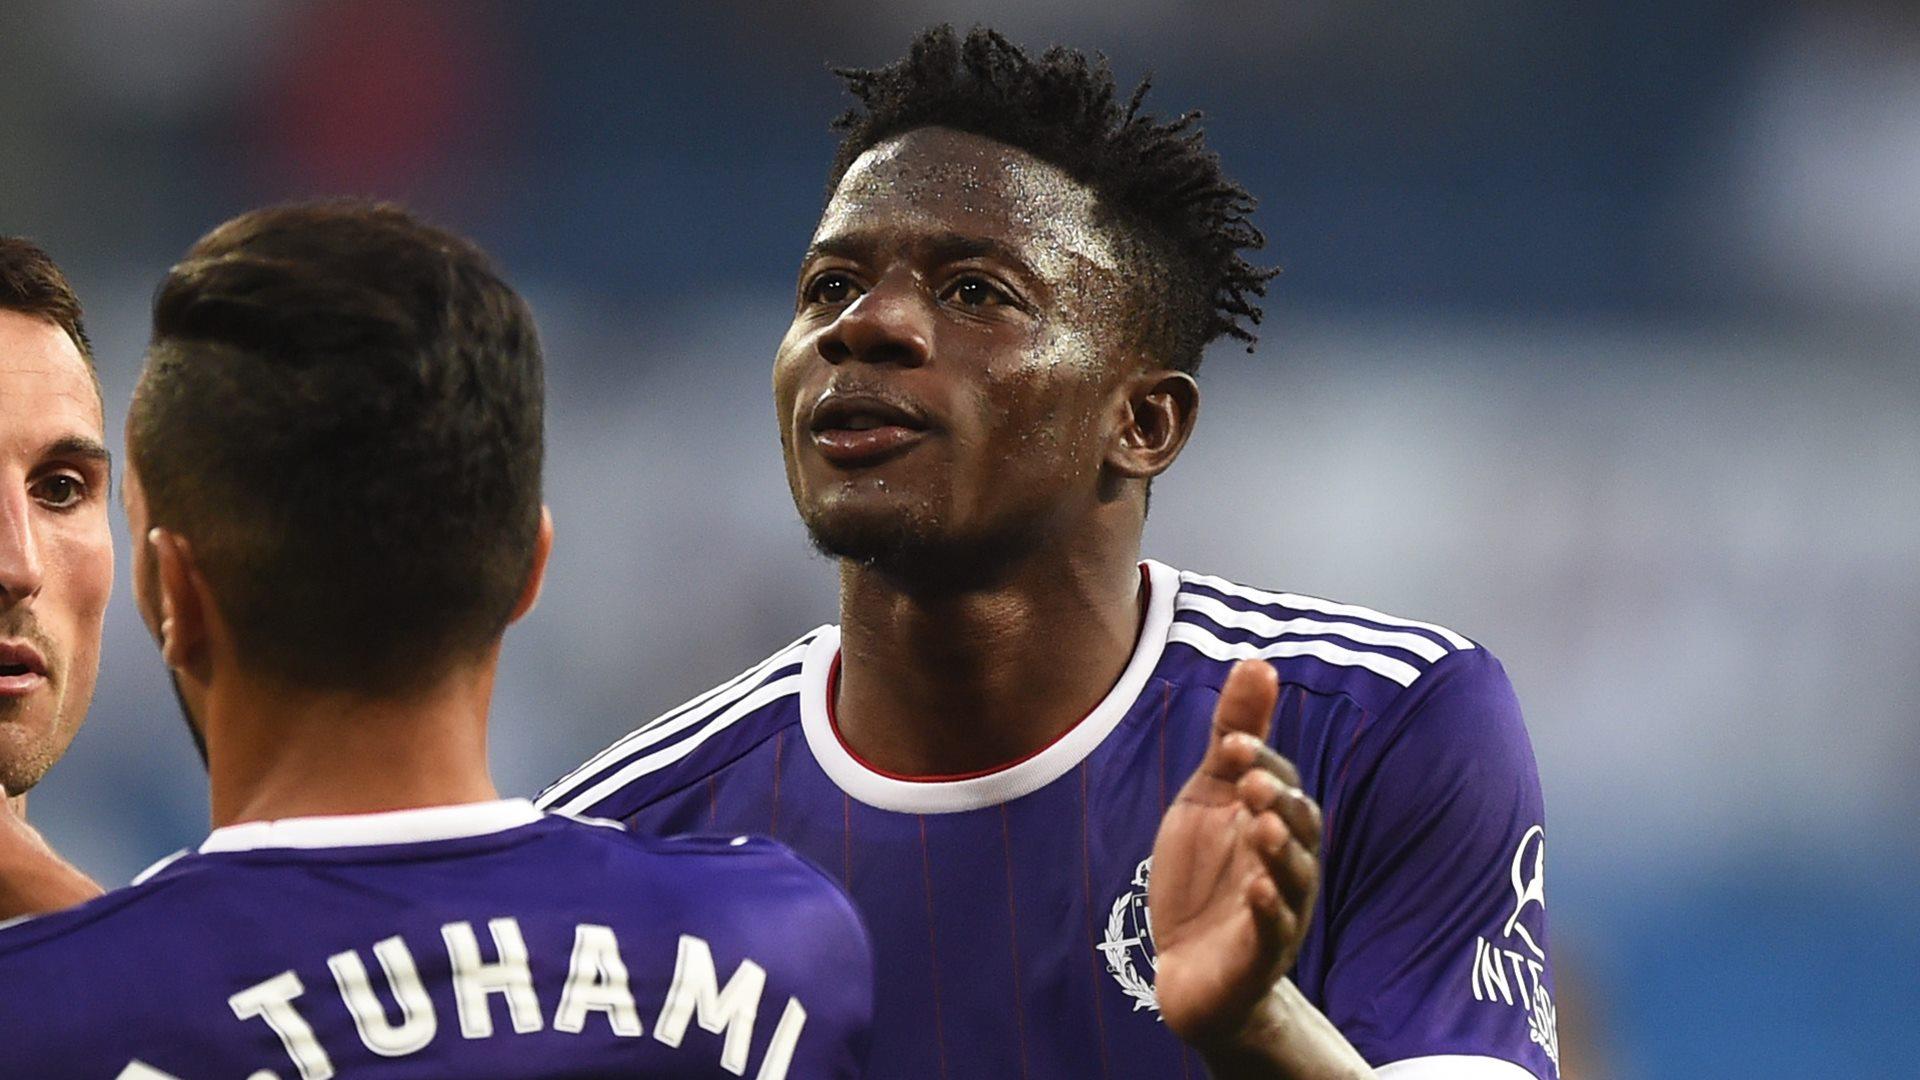 Salisu: Ghana defender joins Southampton from Real Valladolid